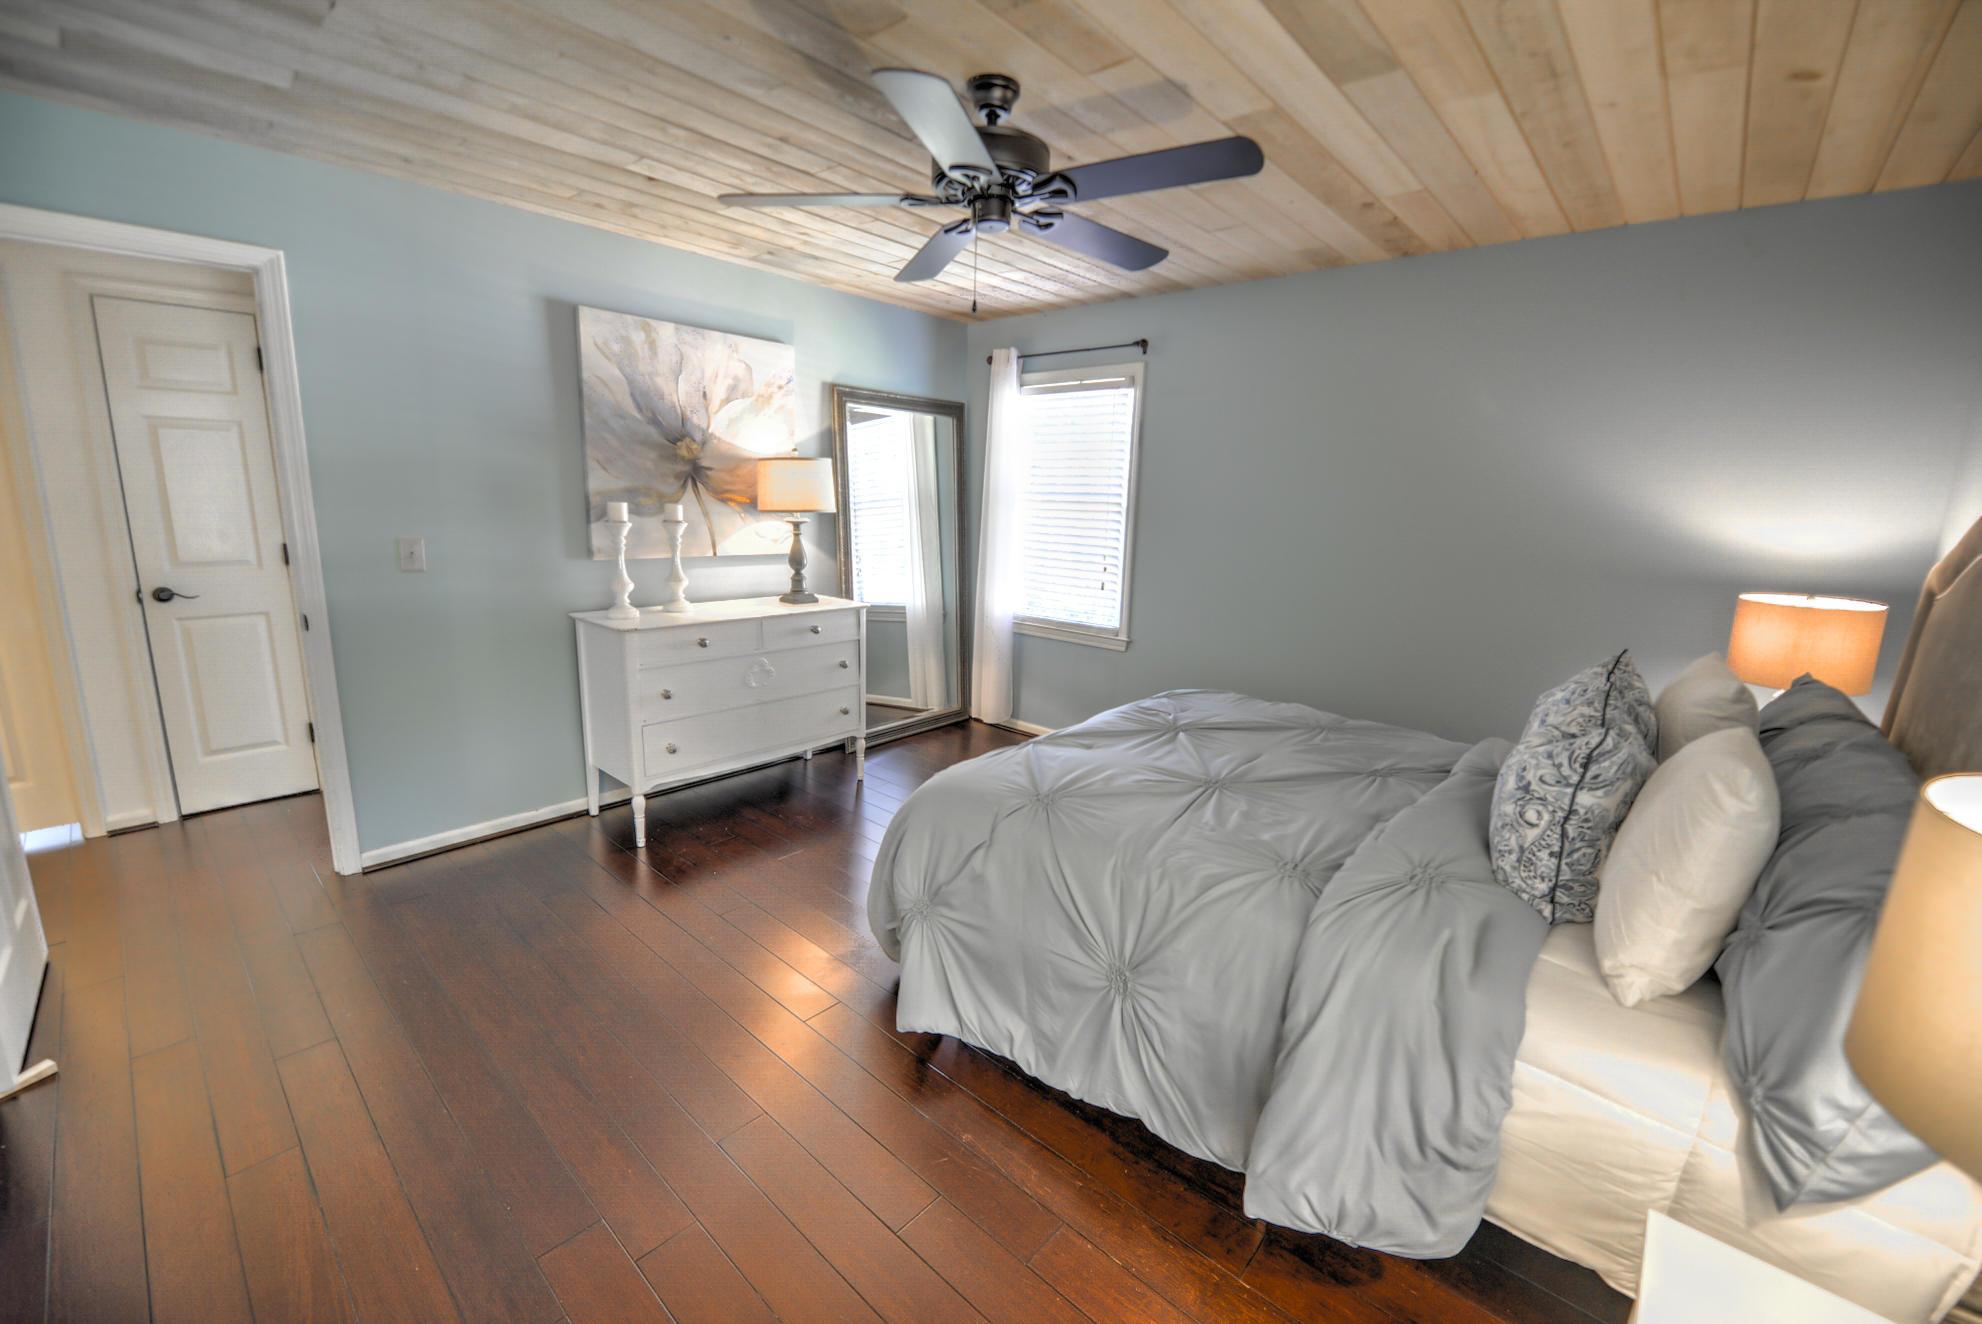 Shemwood II Homes For Sale - 1017 Jack Snipe, Mount Pleasant, SC - 6